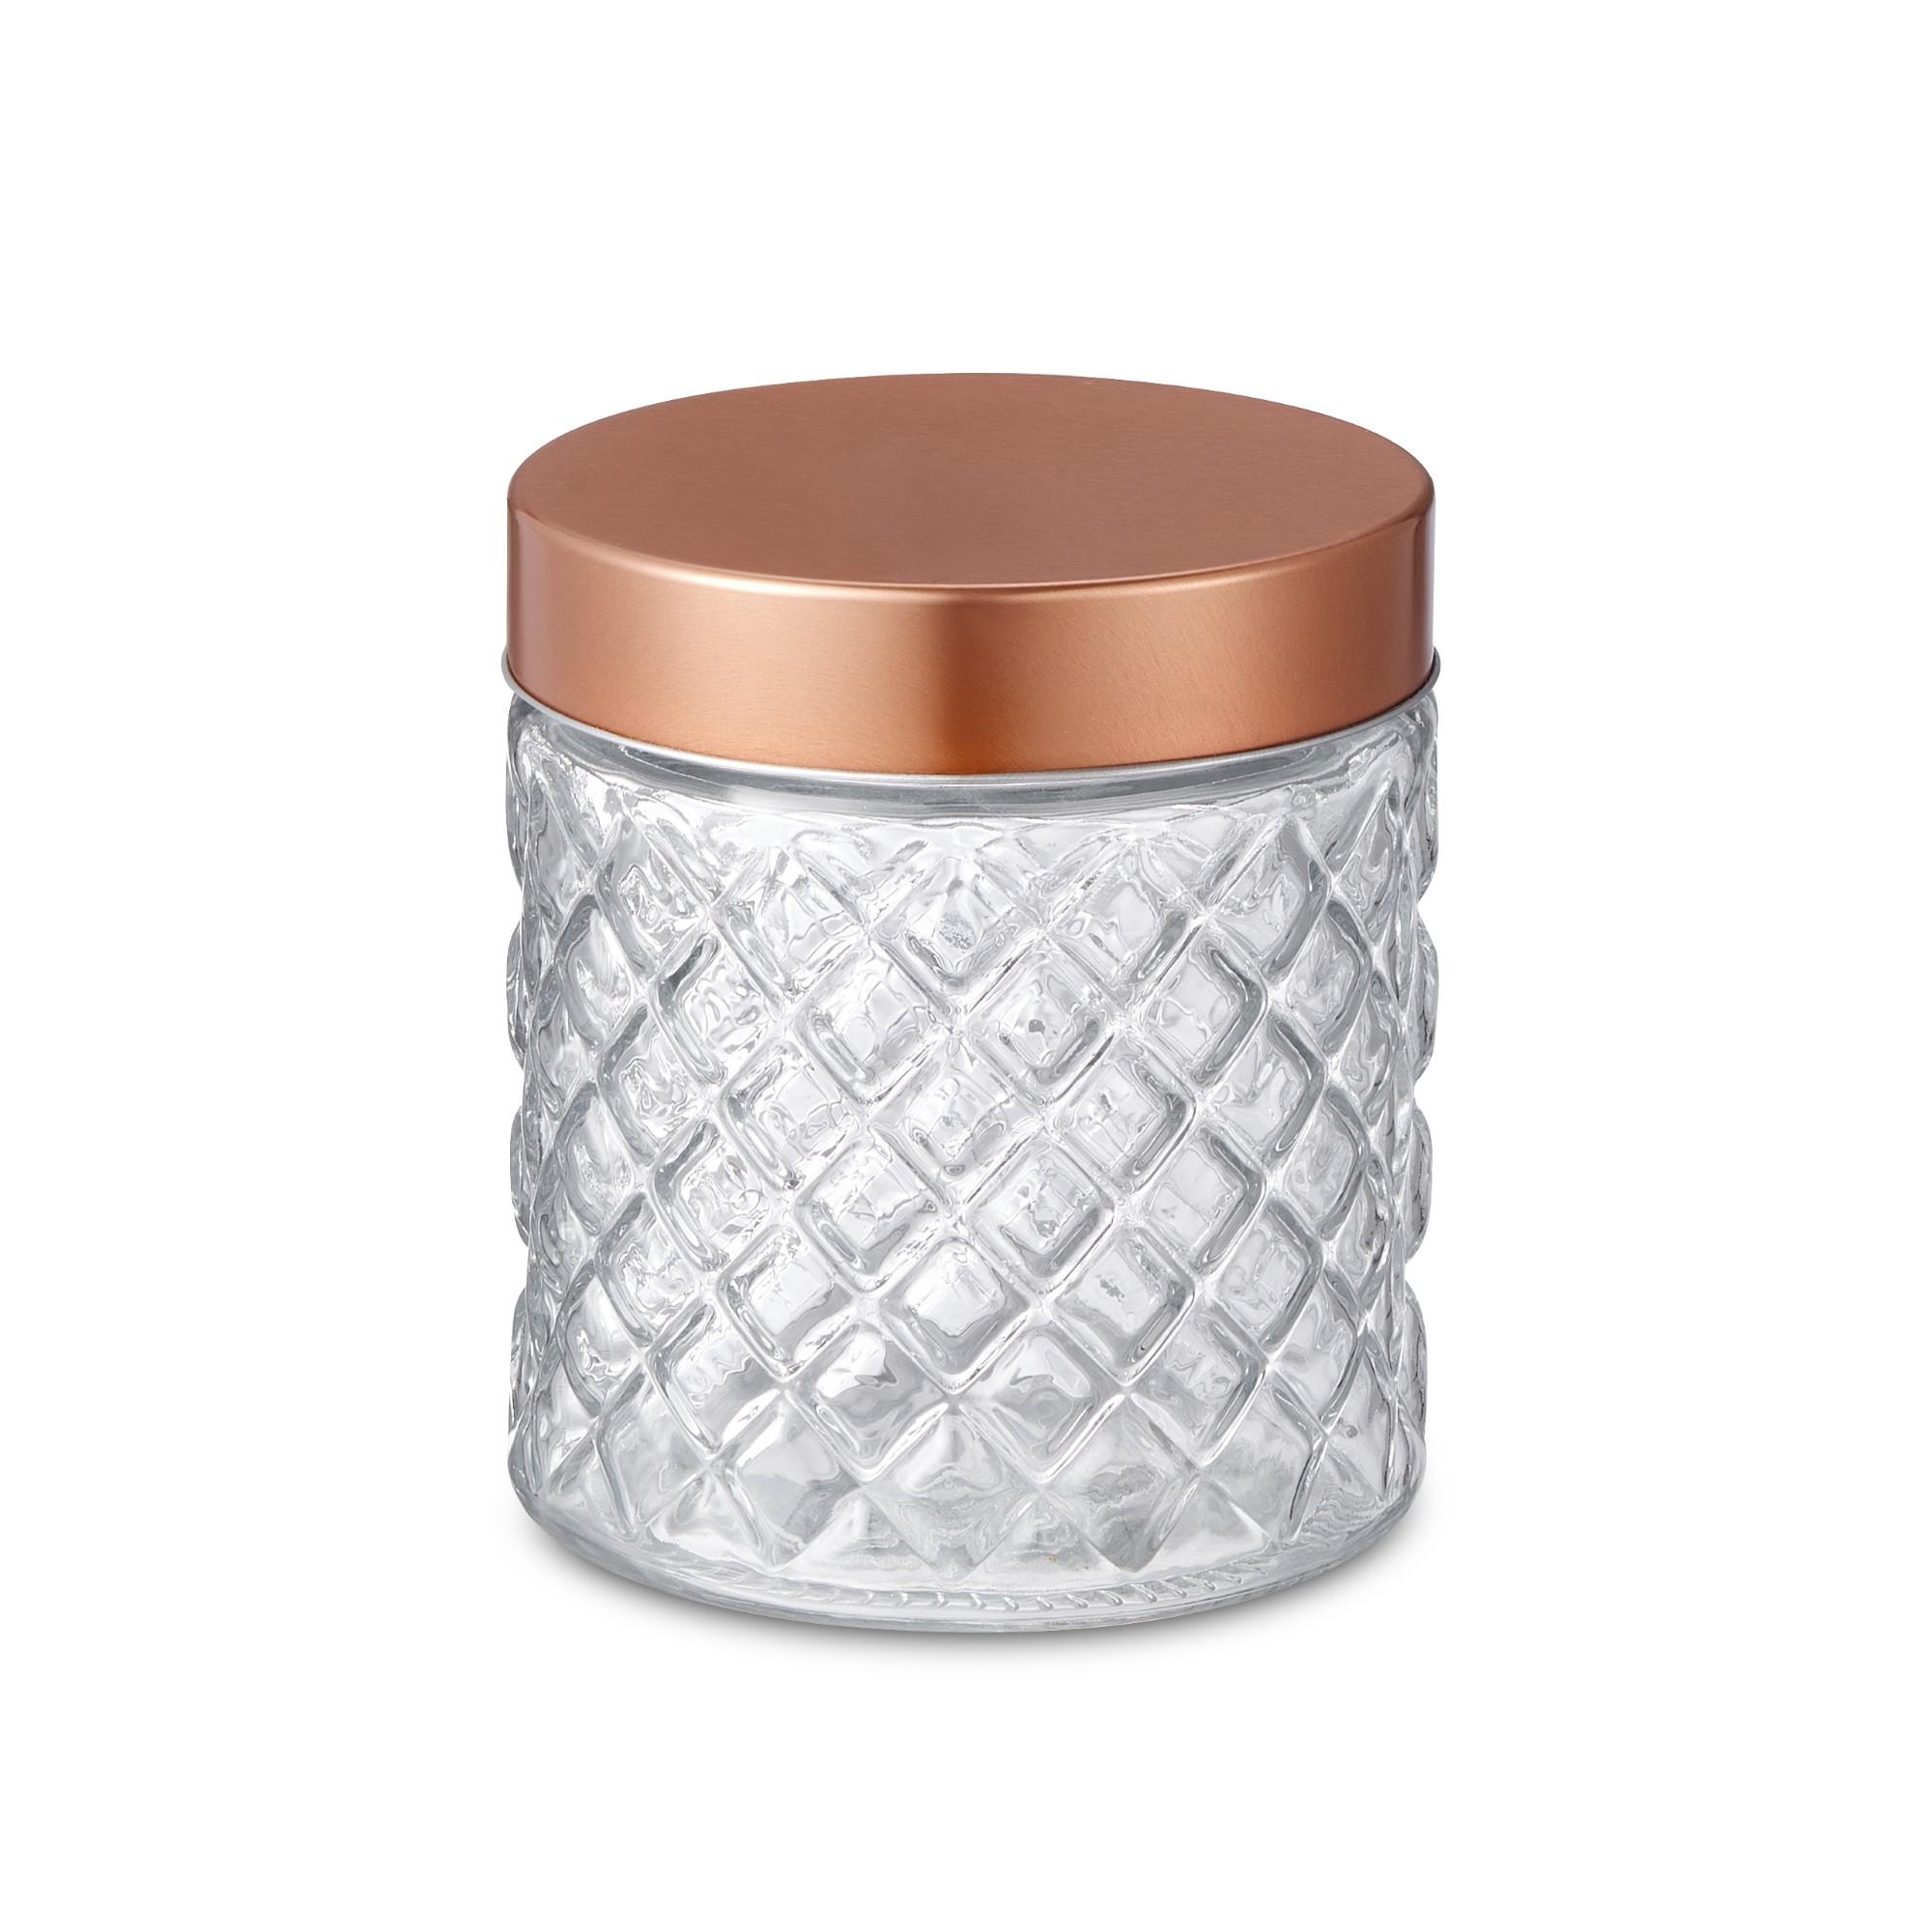 Pote de Vidro Redondo 0750L 11 cm com Tampa Bronze - Bencafil